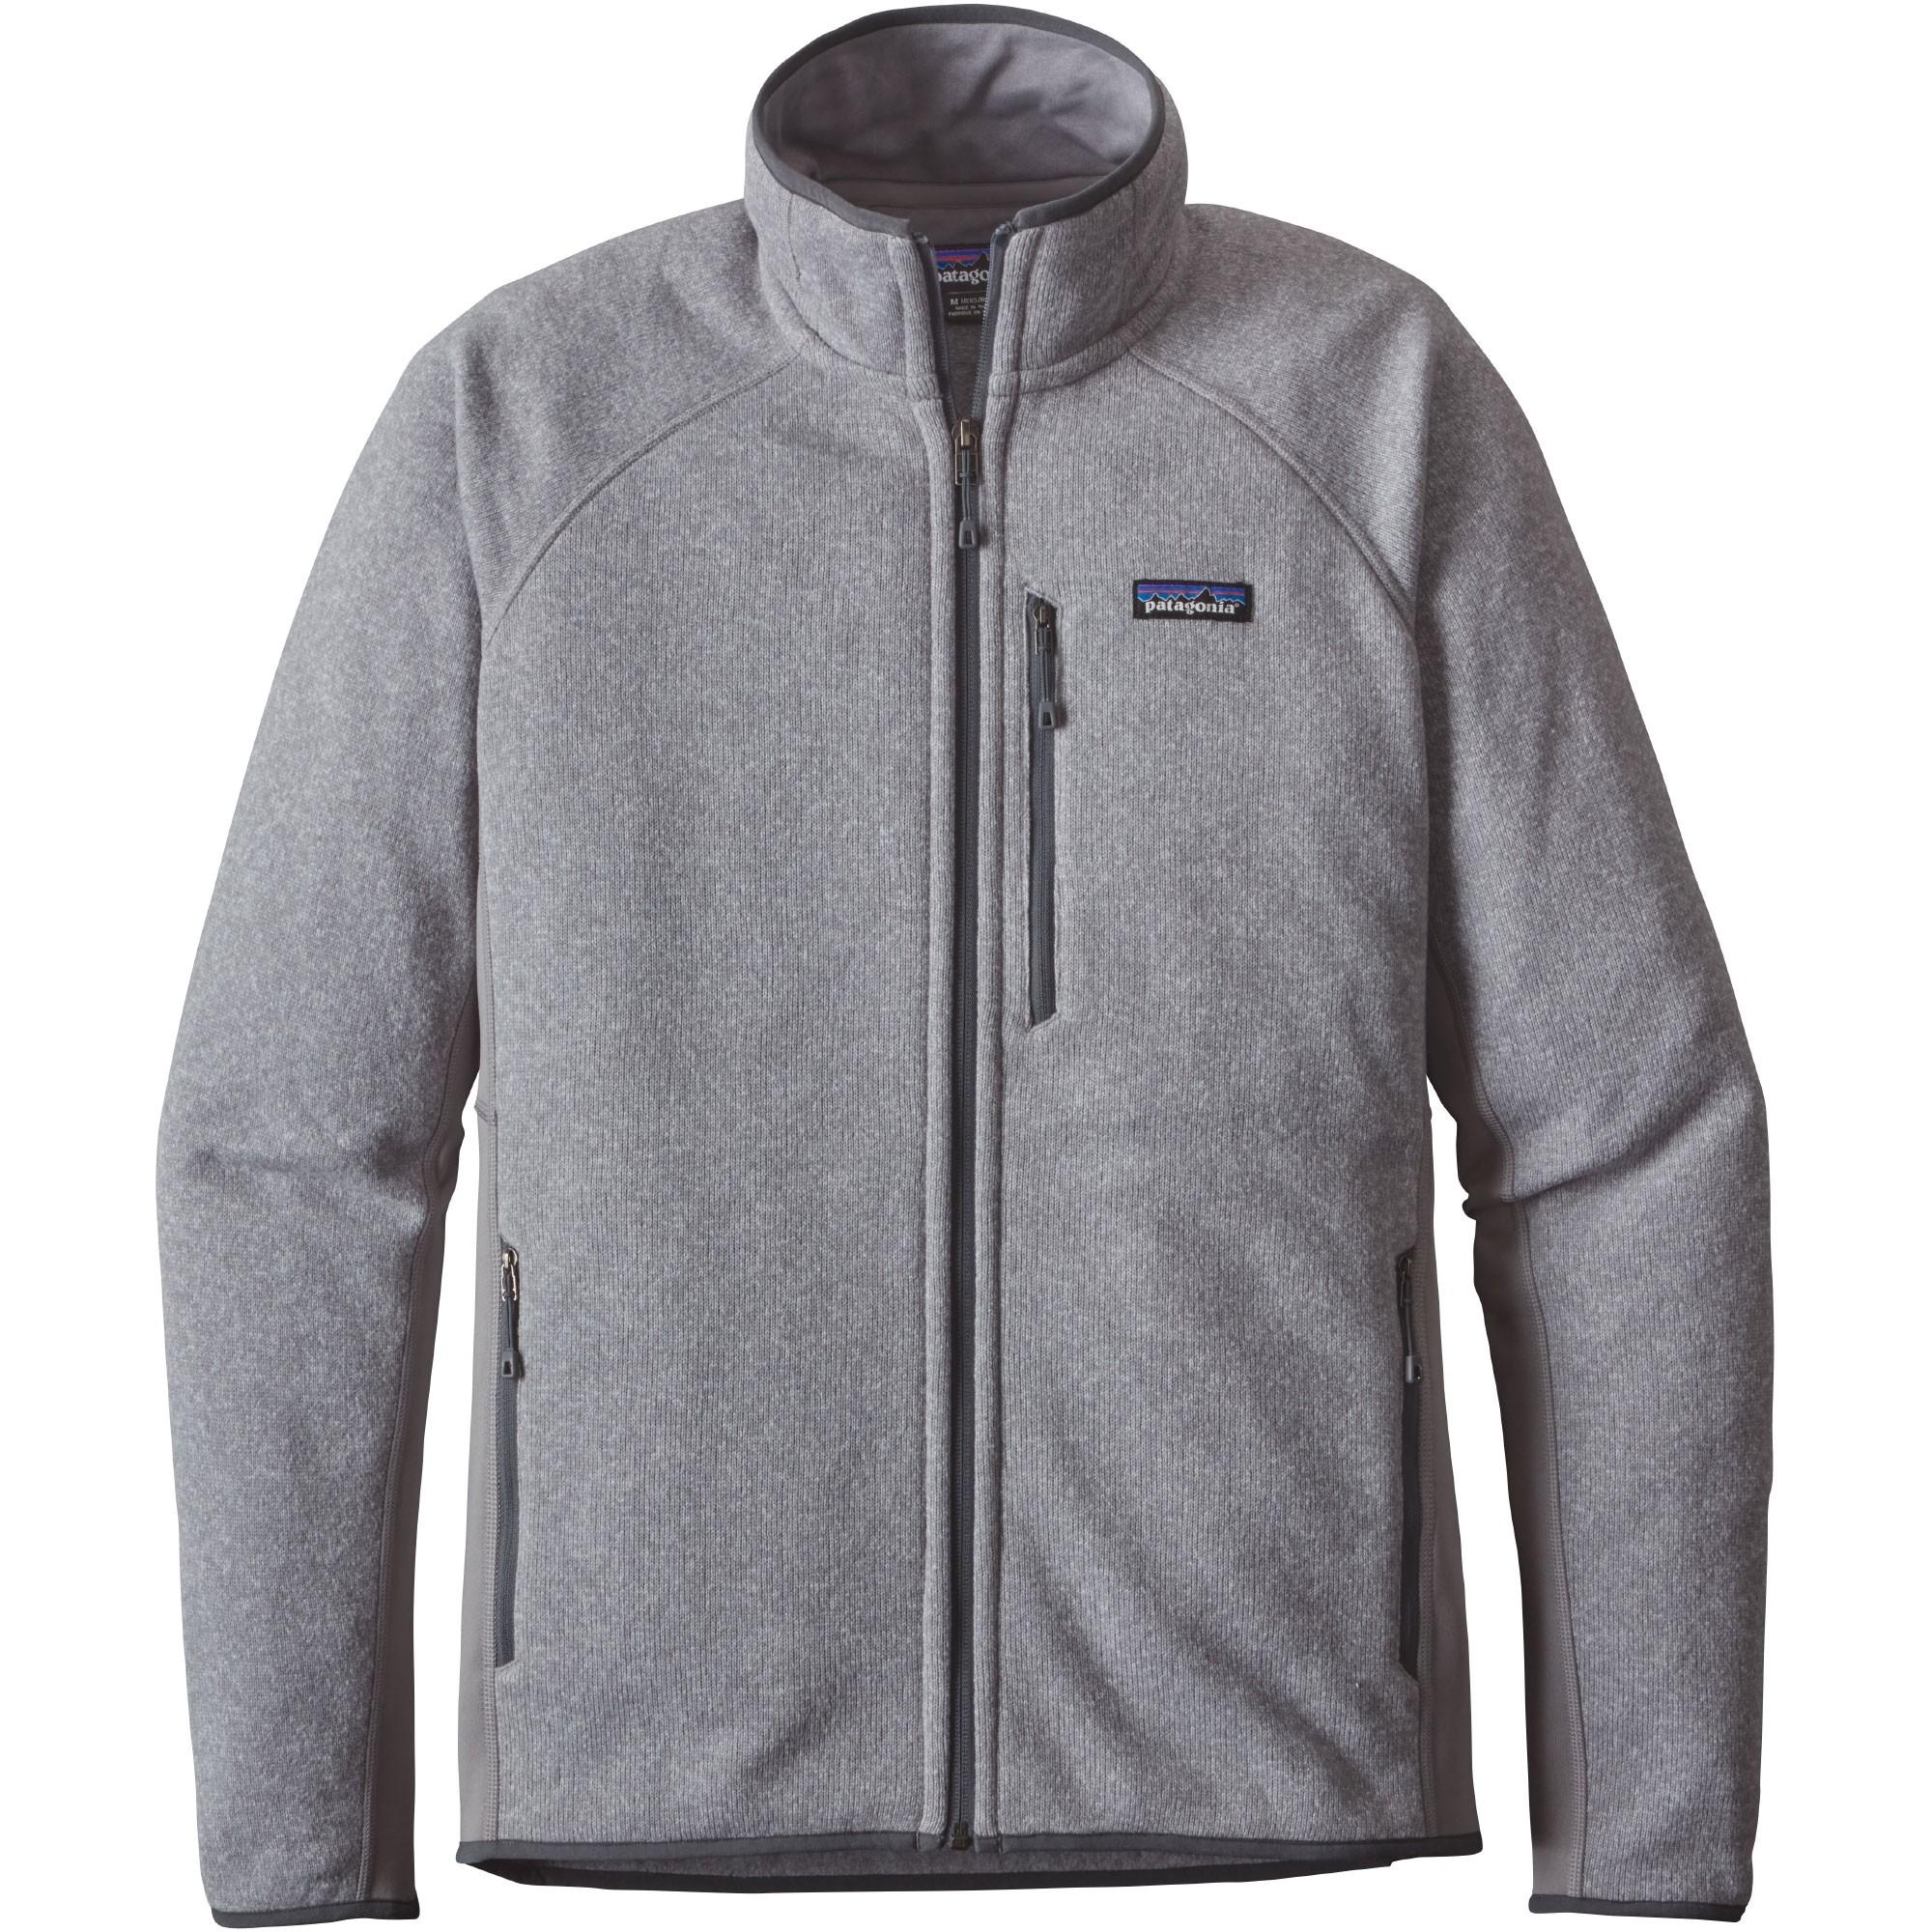 Performance Better Sweater Men's Fleece Jacket - Feather Grey